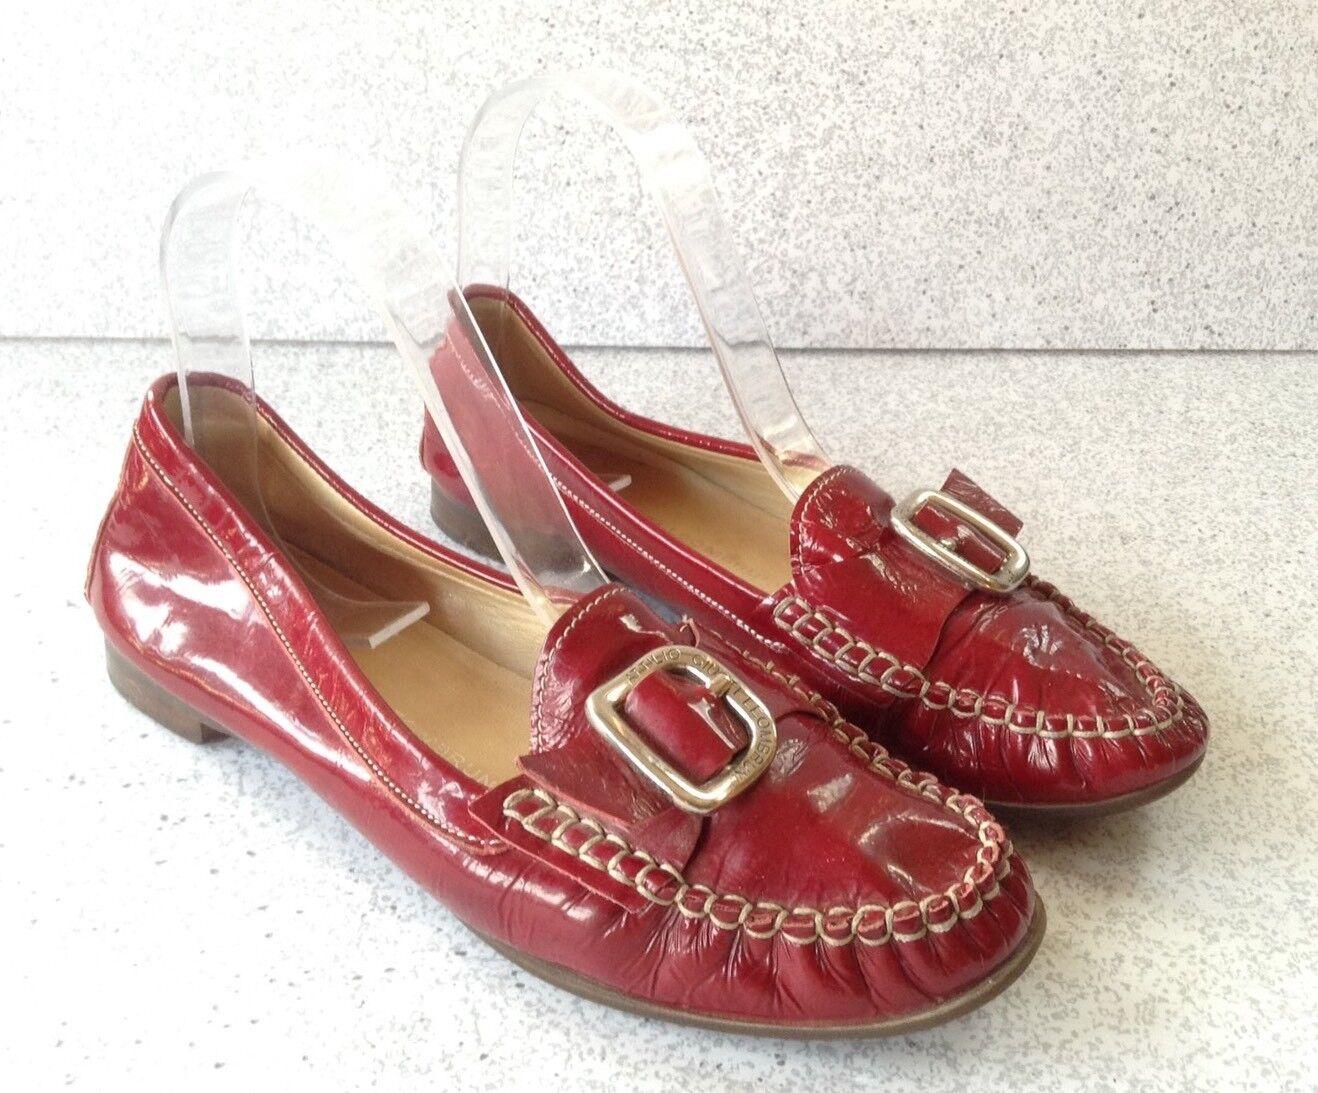 Attilio Giusti Leombruni Loafers Women's Loafers Leombruni Size 36 Red Patent Leather White Stitch ba6580